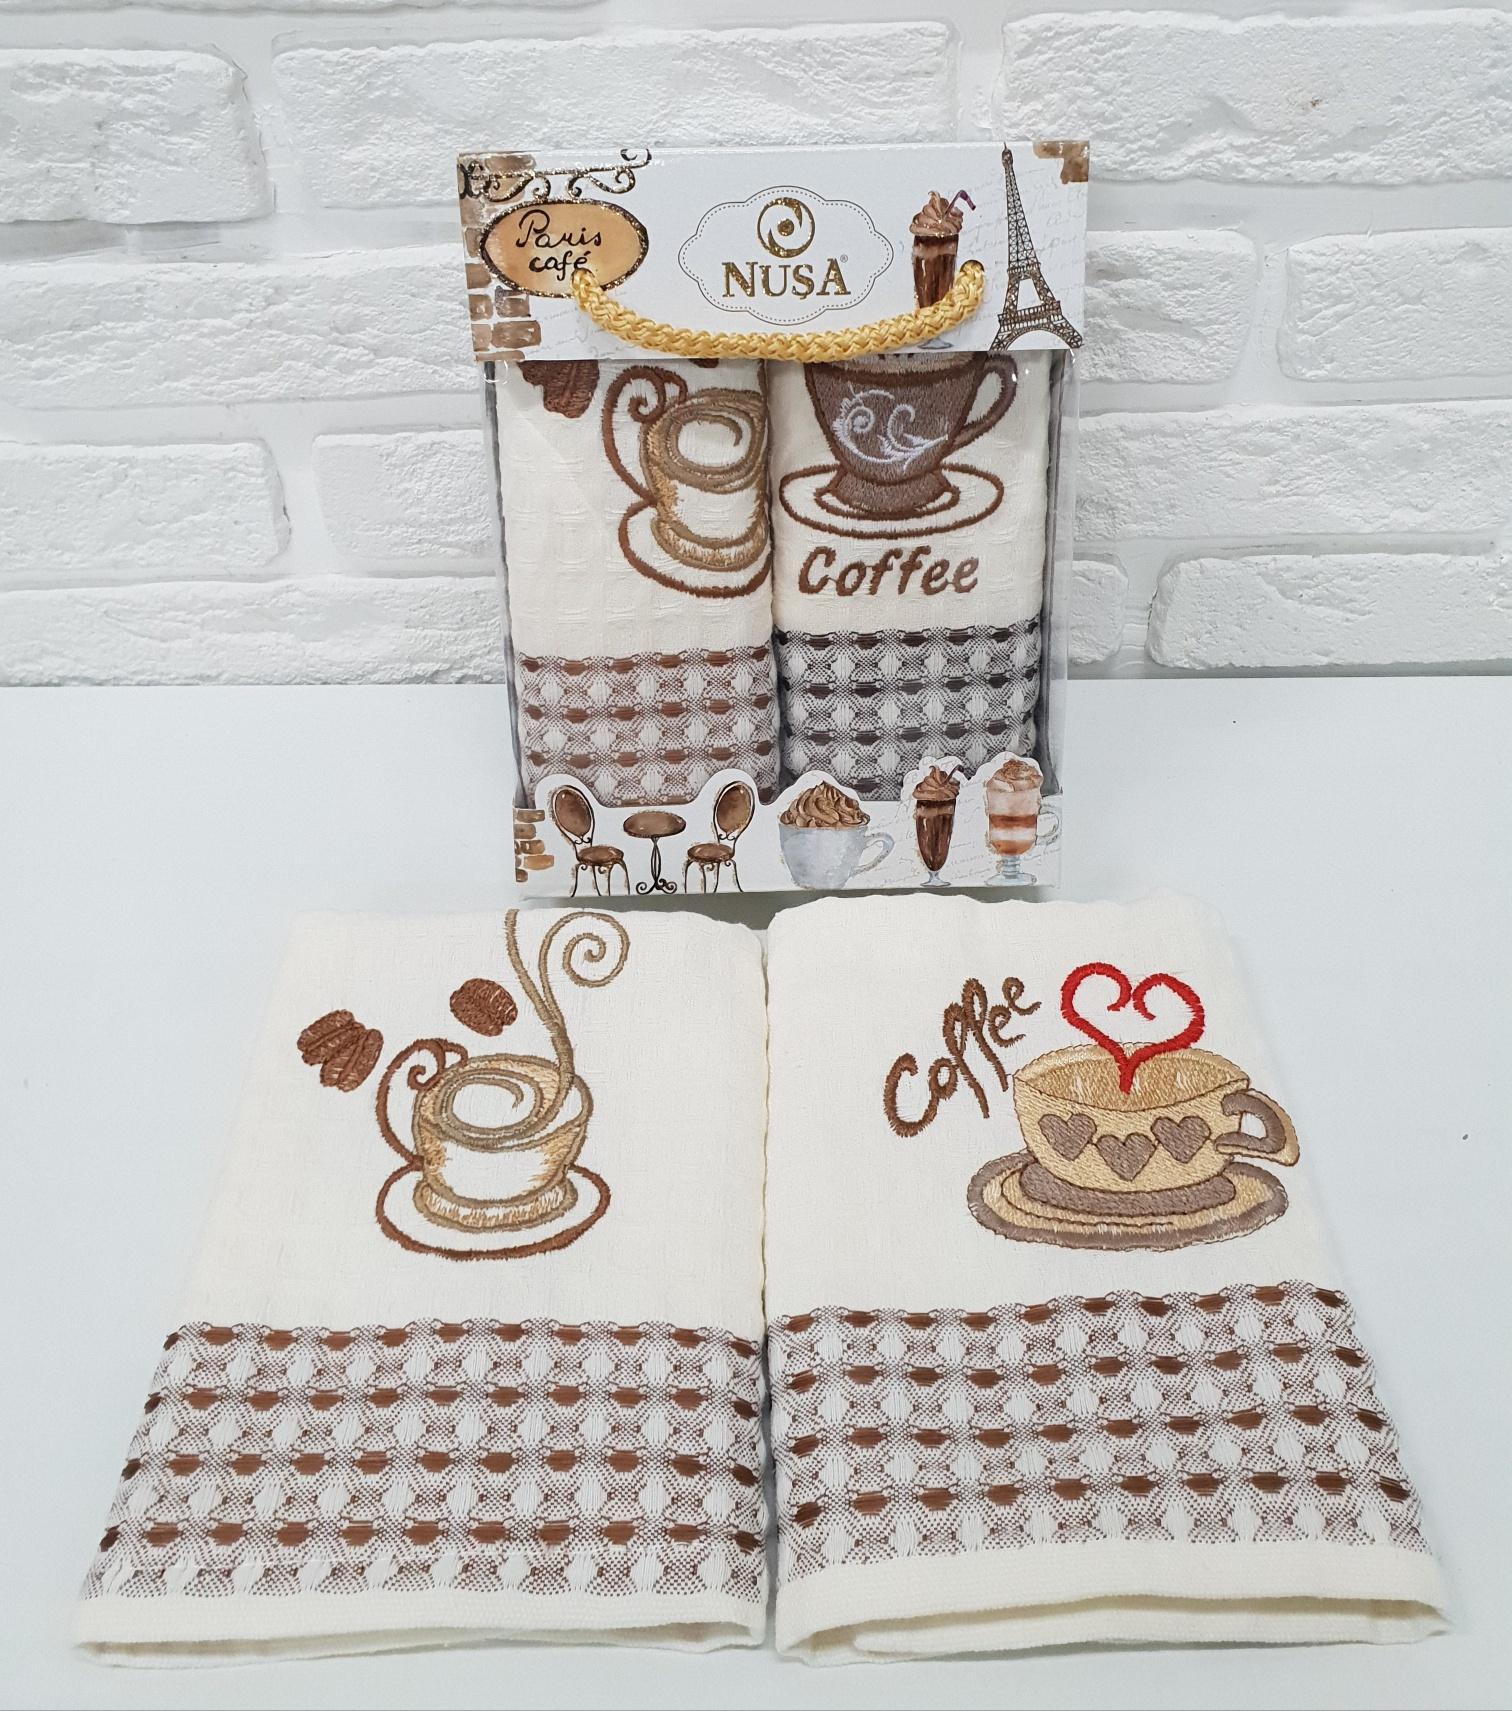 Купить Полотенца Nusa, Кухонное полотенце Кофе (35х50 см - 2 шт), Турция, Вафля